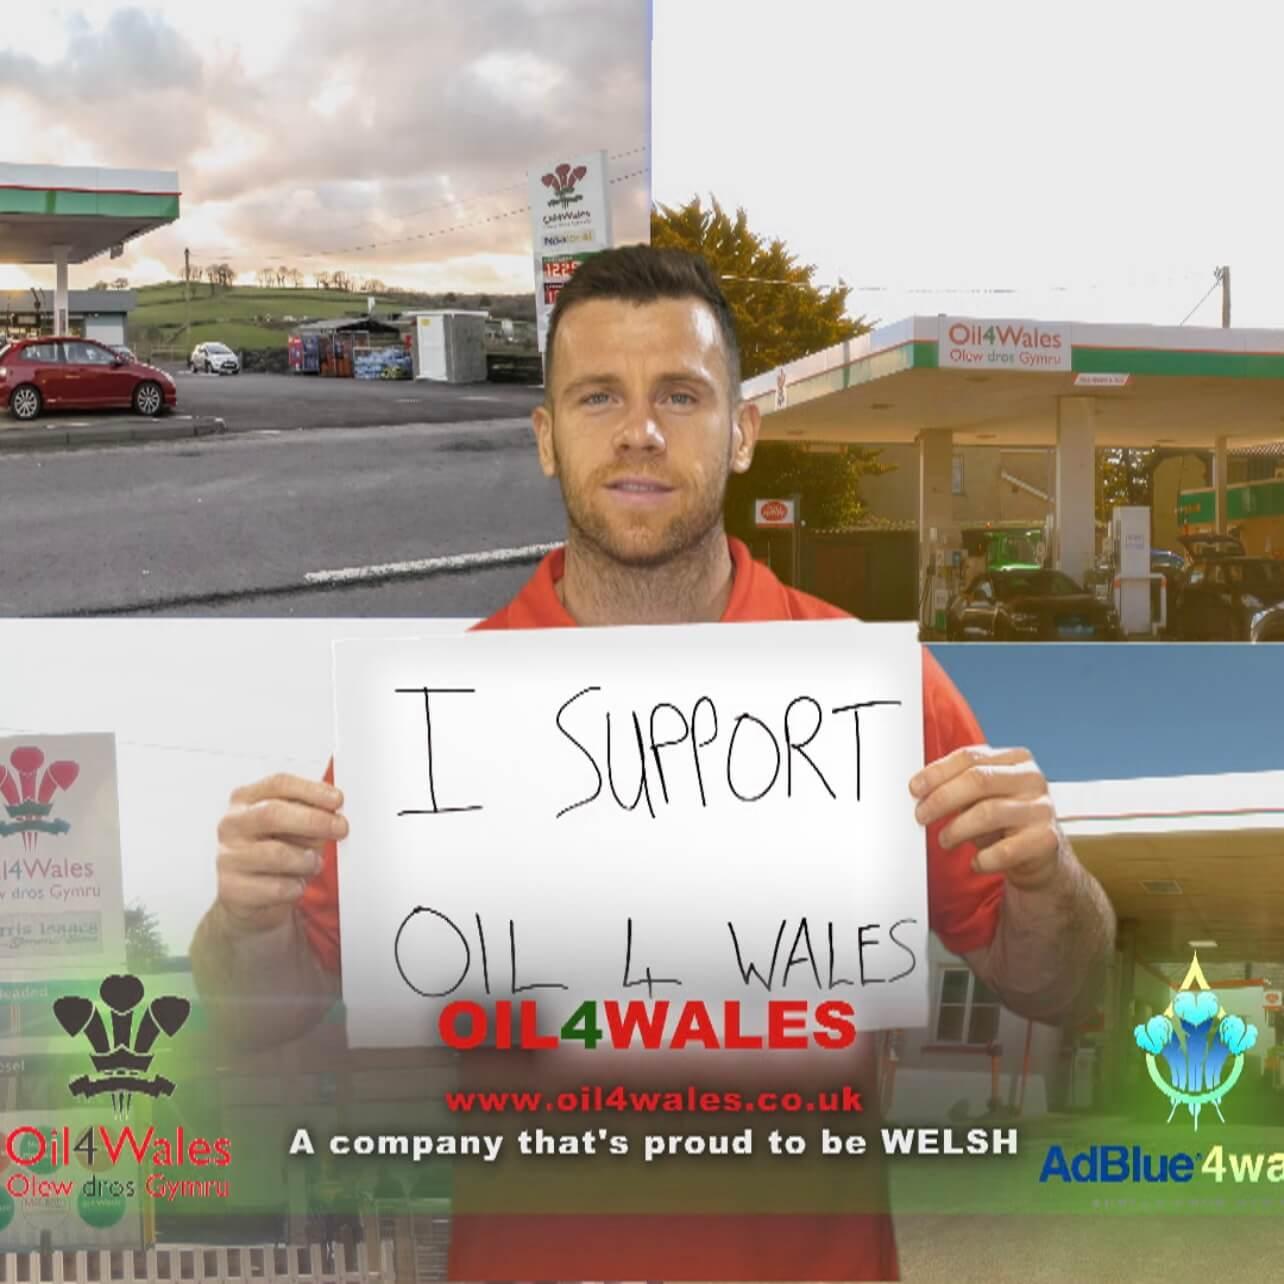 https://www.oil4wales.co.uk/wp-content/uploads/2021/08/garethdavies.jpg